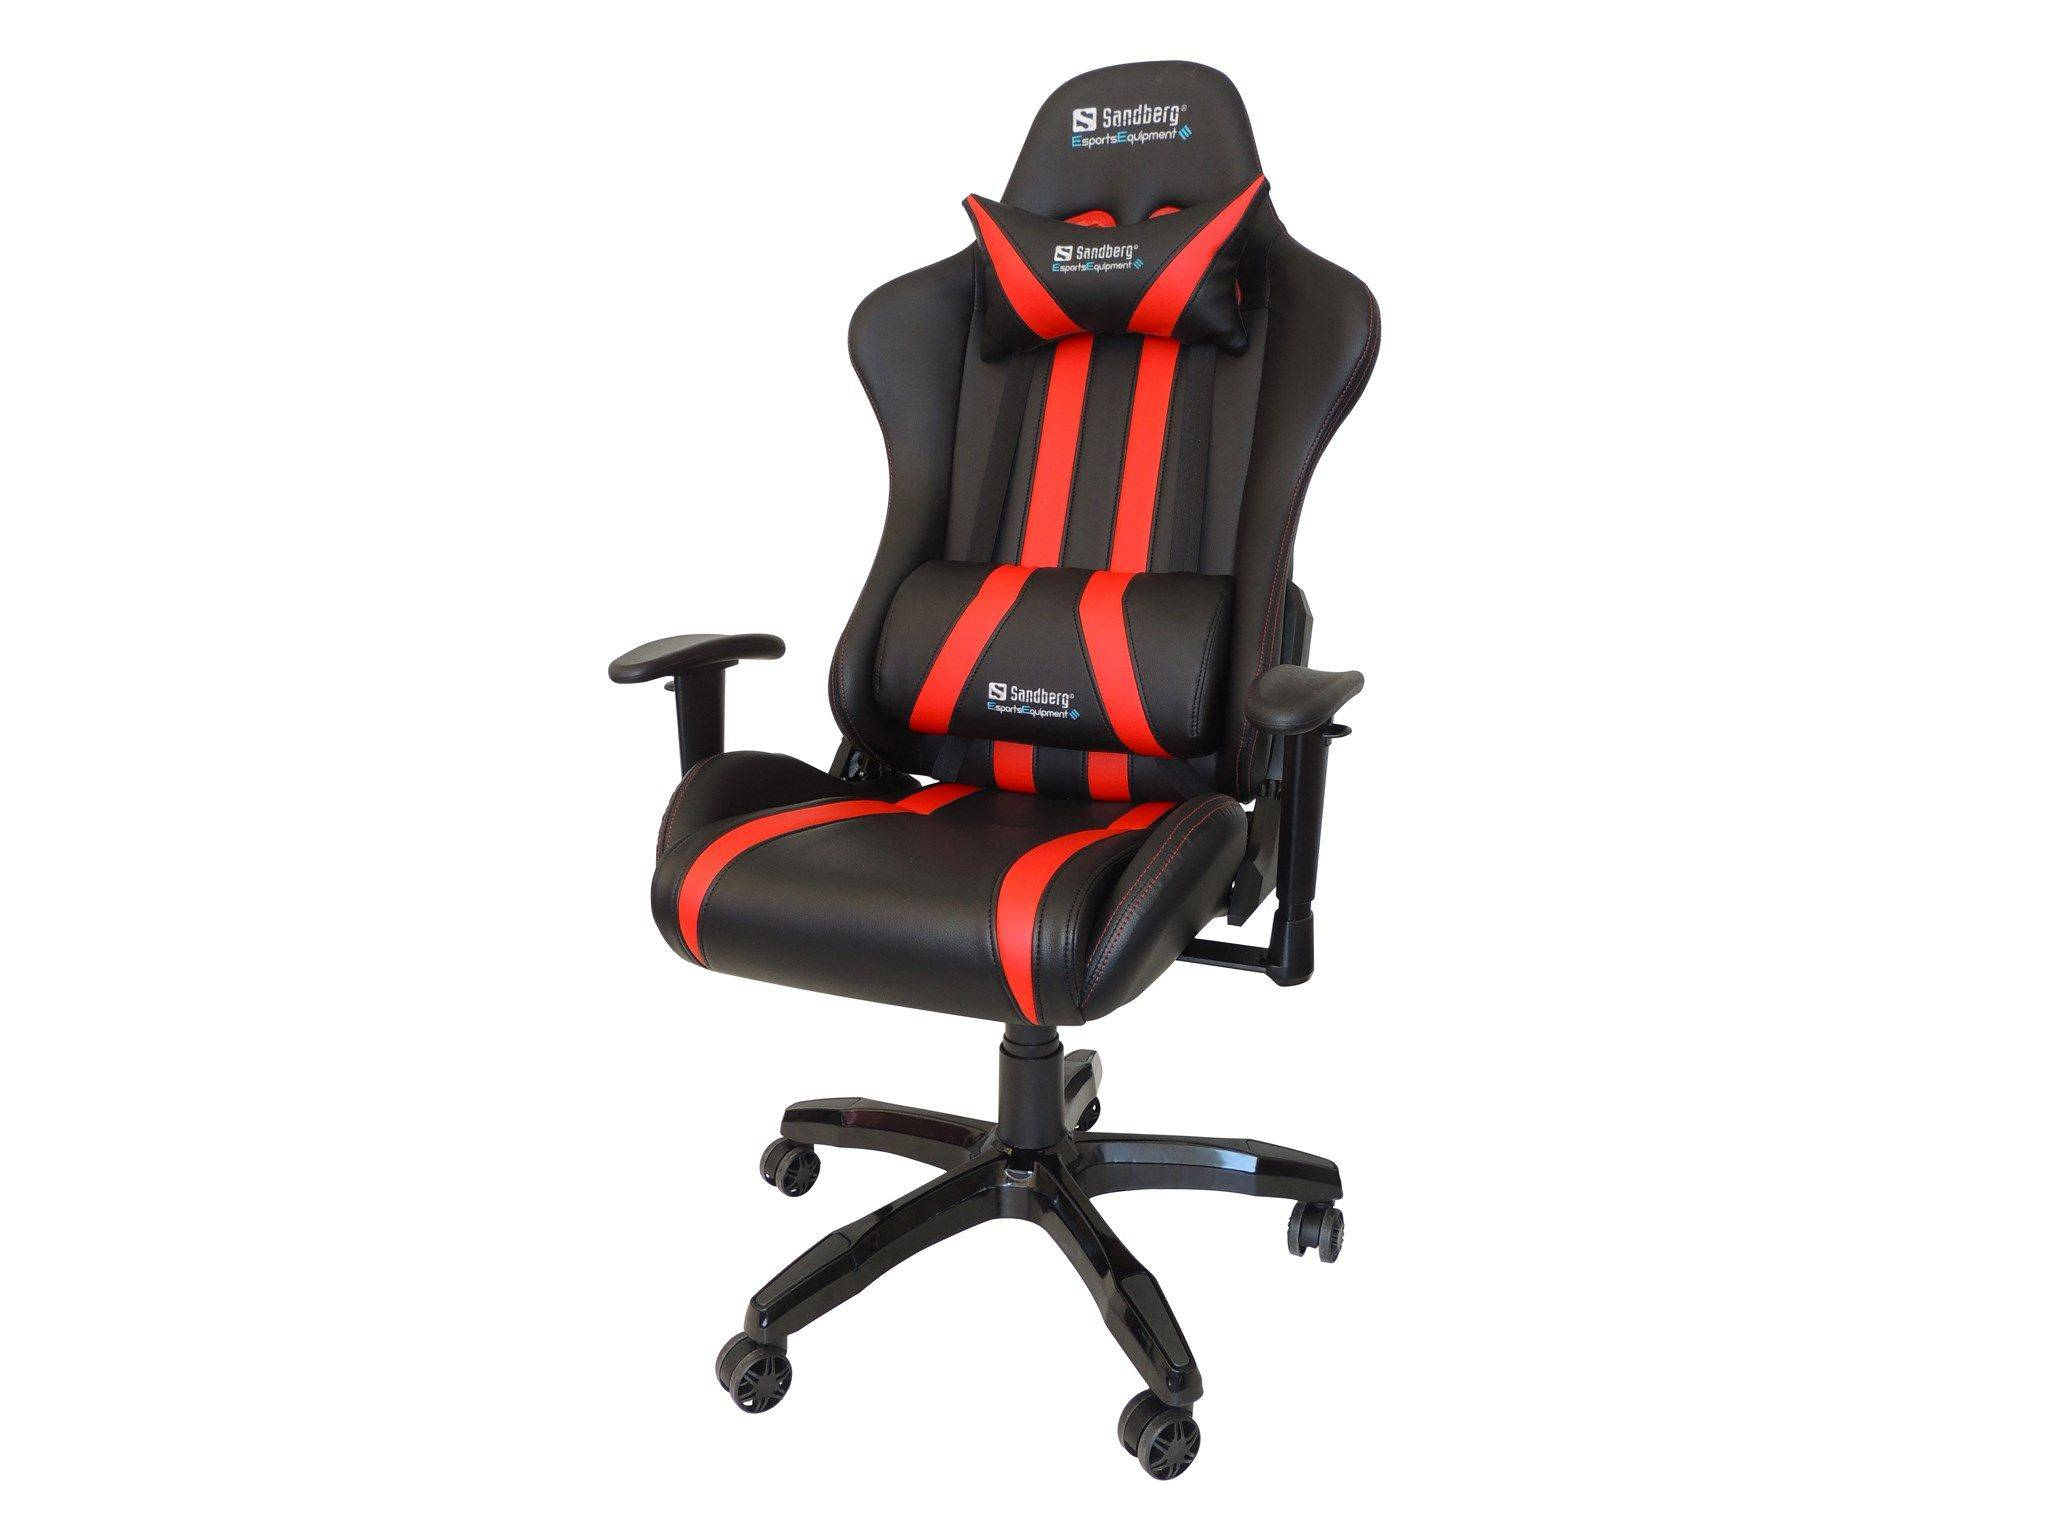 Sandberg Comma nder Gaming Chair